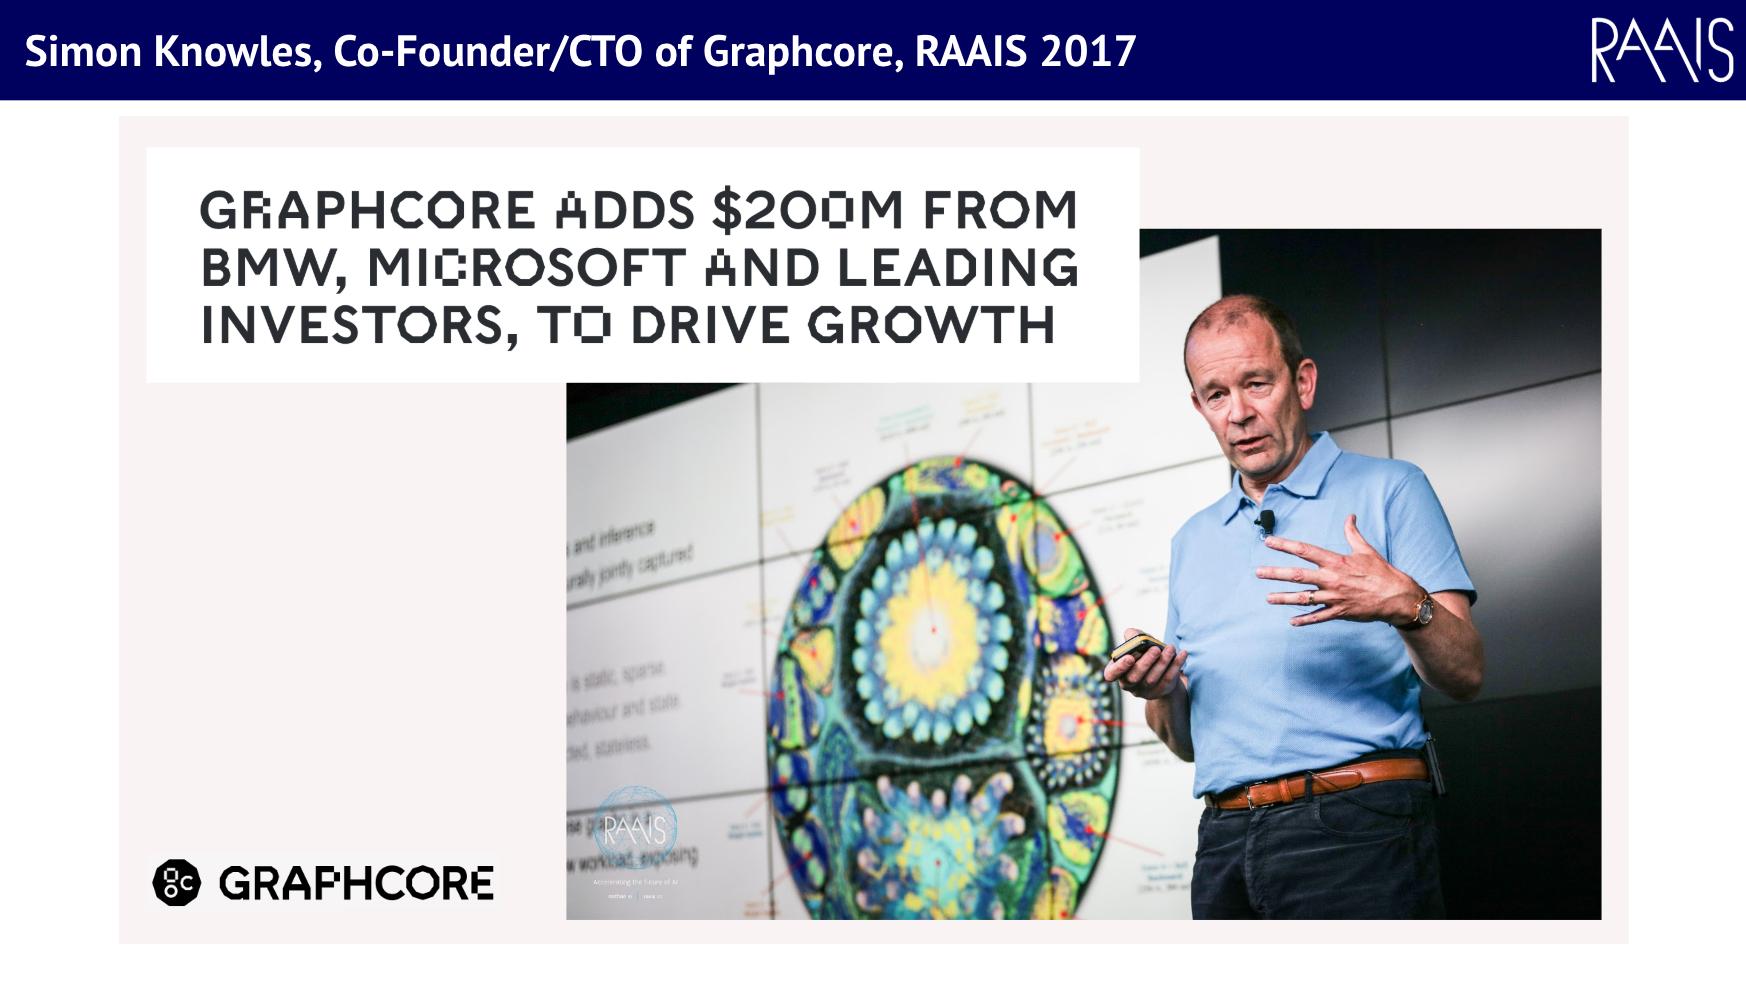 Simon Knowles, Graphcore, RAAIS 2017